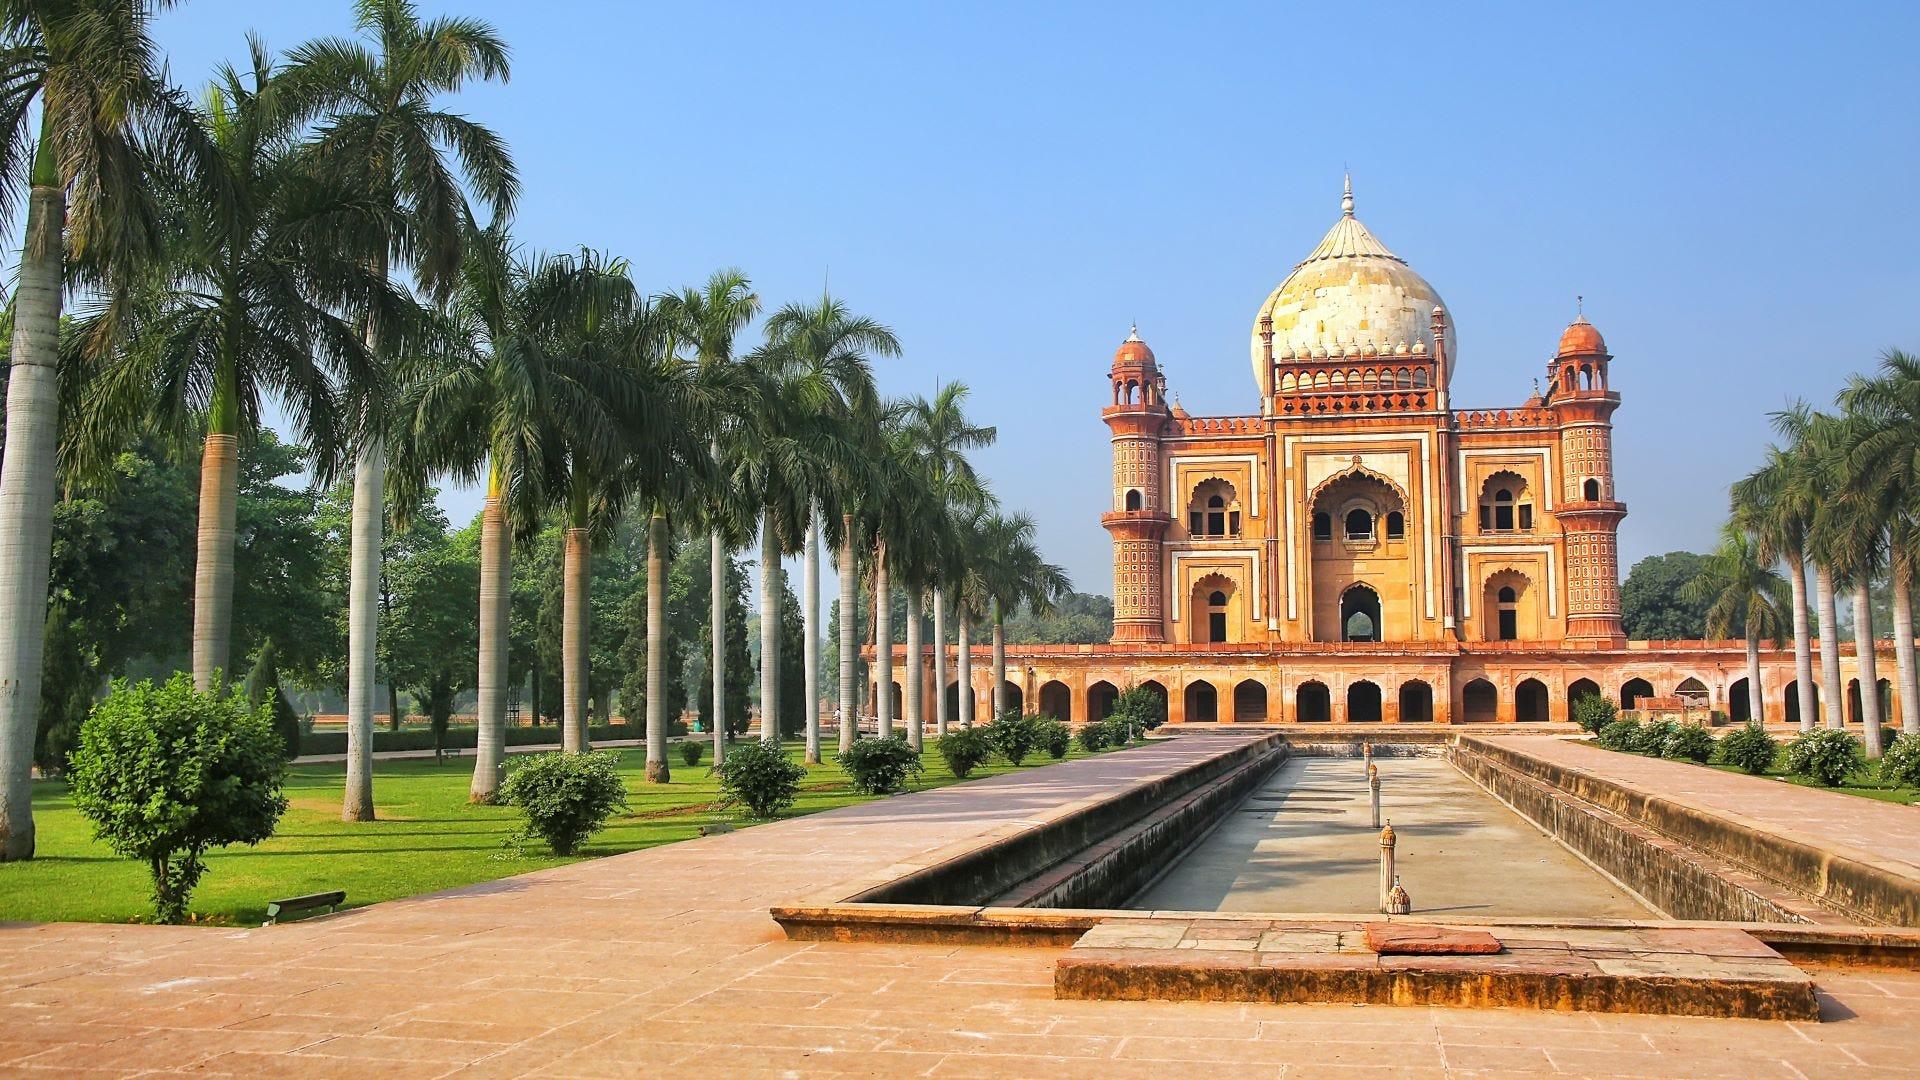 The Tomb of Safdarjung in New Delhi, India.